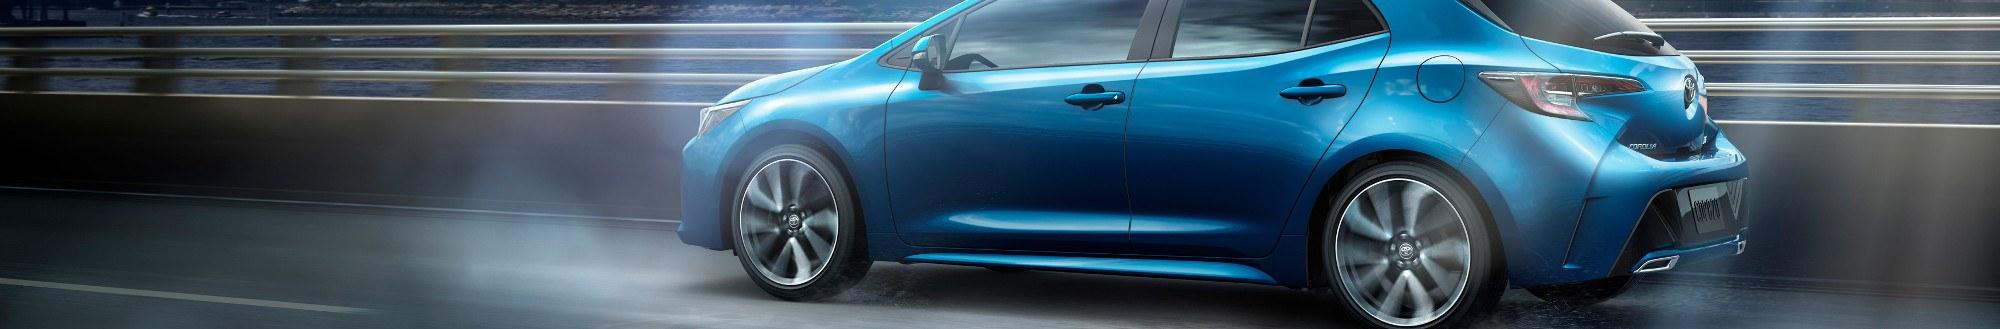 2019-Toyota-Corolla-Hatchback-Feature-Milton-Toronto-Incentives